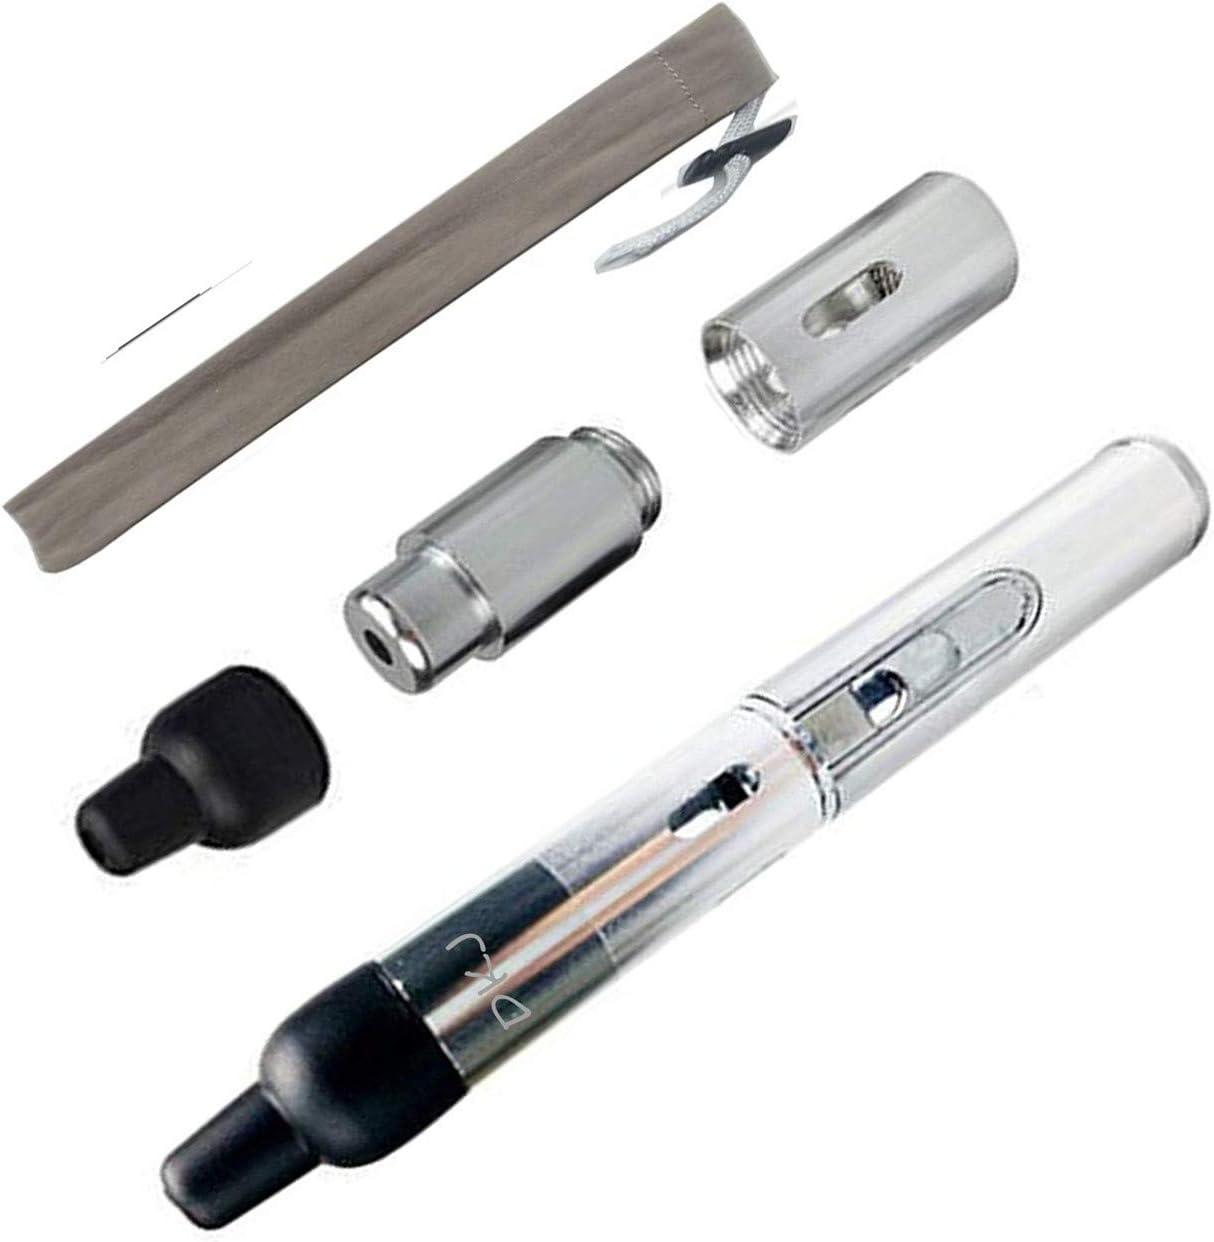 Fengfang Jet Gas Flame Butane Torch Handheld Lighter (silver)